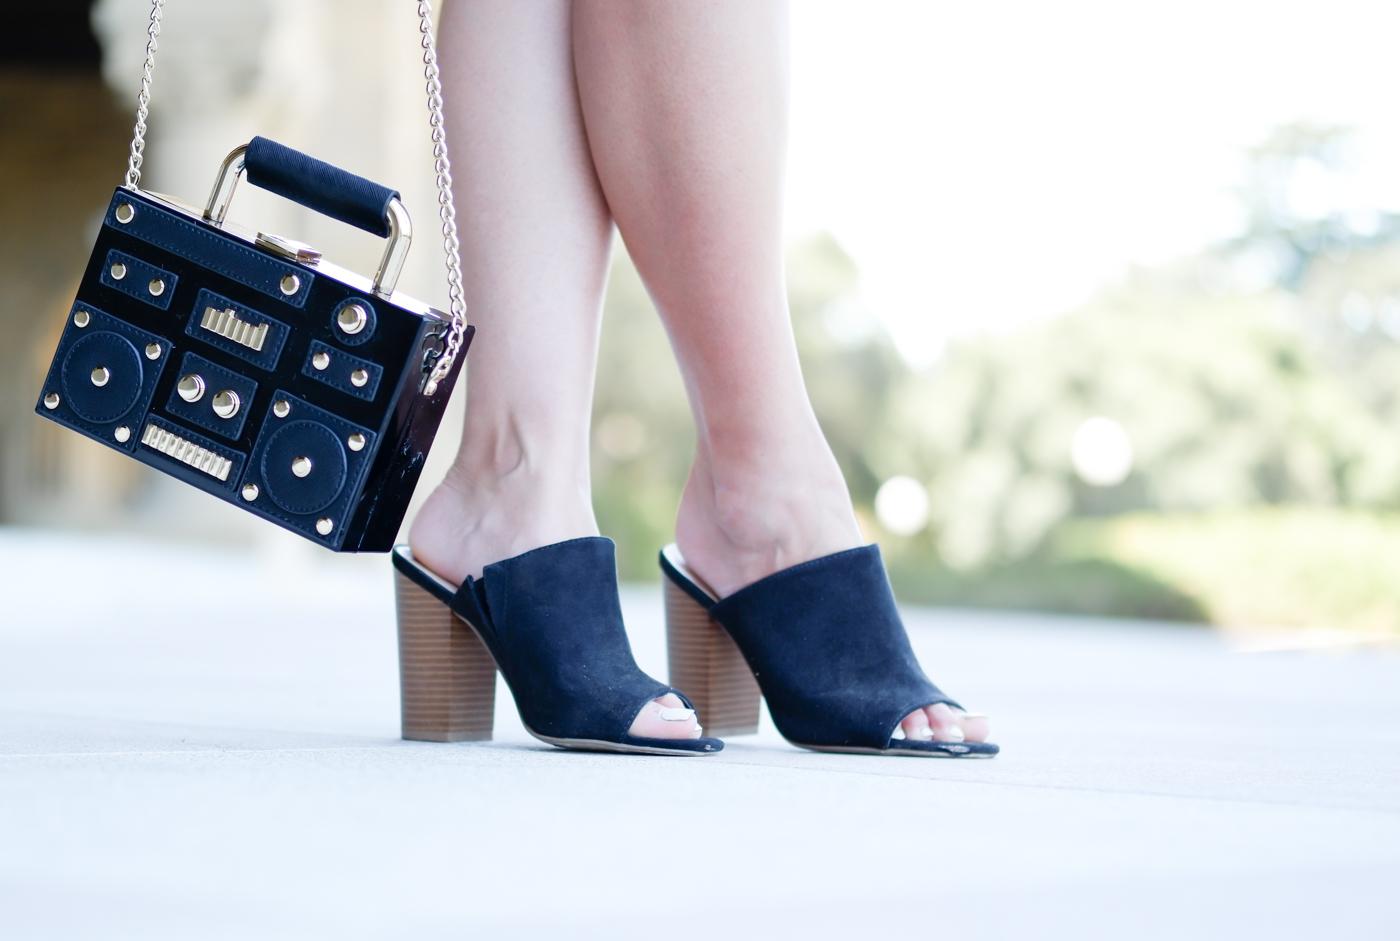 Zara stereo crossbody bag & JustFab mules | The Chic Diary